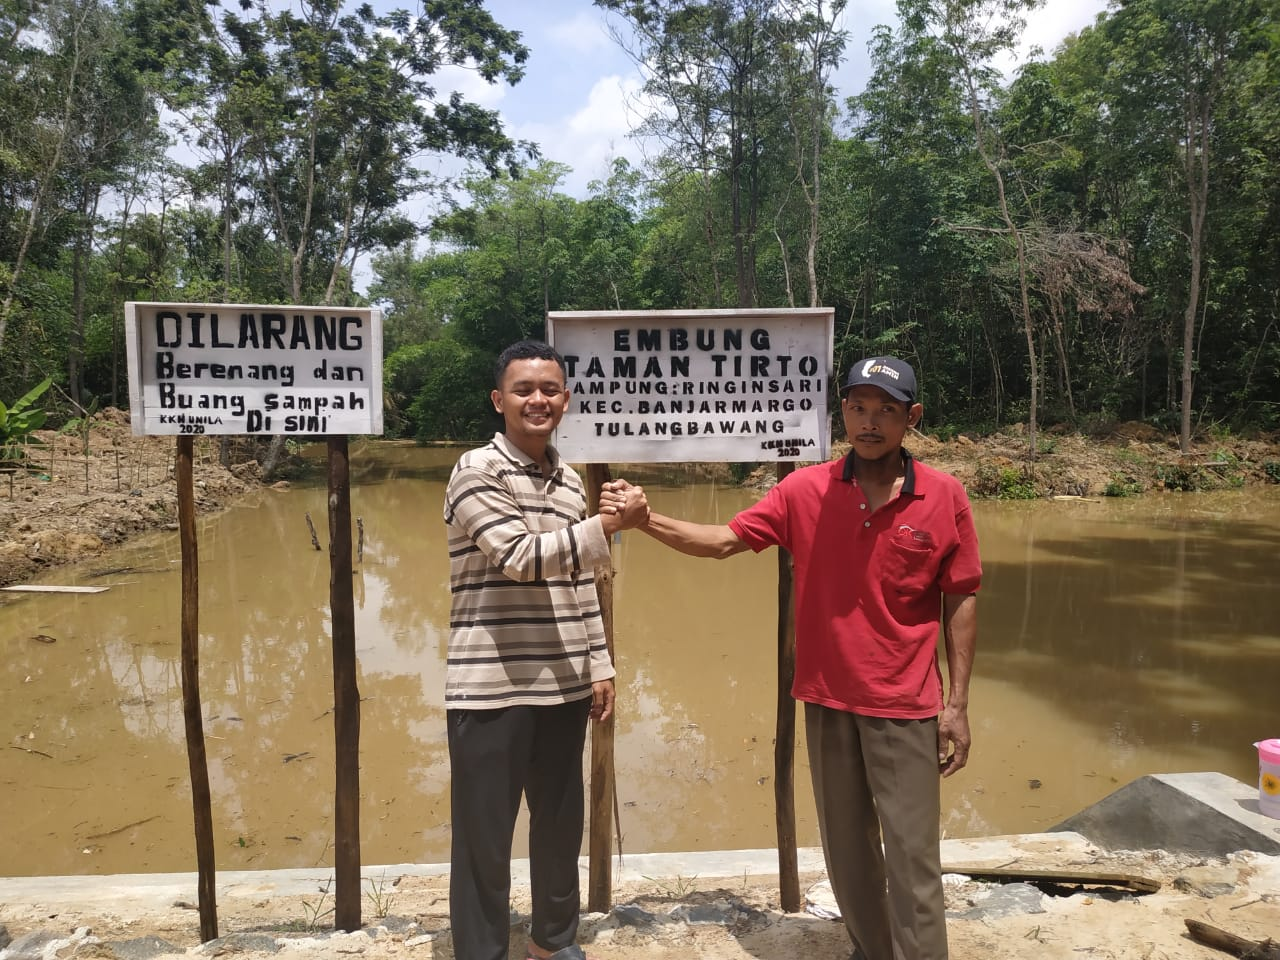 """Embung Kampung Salah Satu Hasil Pembangunan Kampung Ringin Sari"""